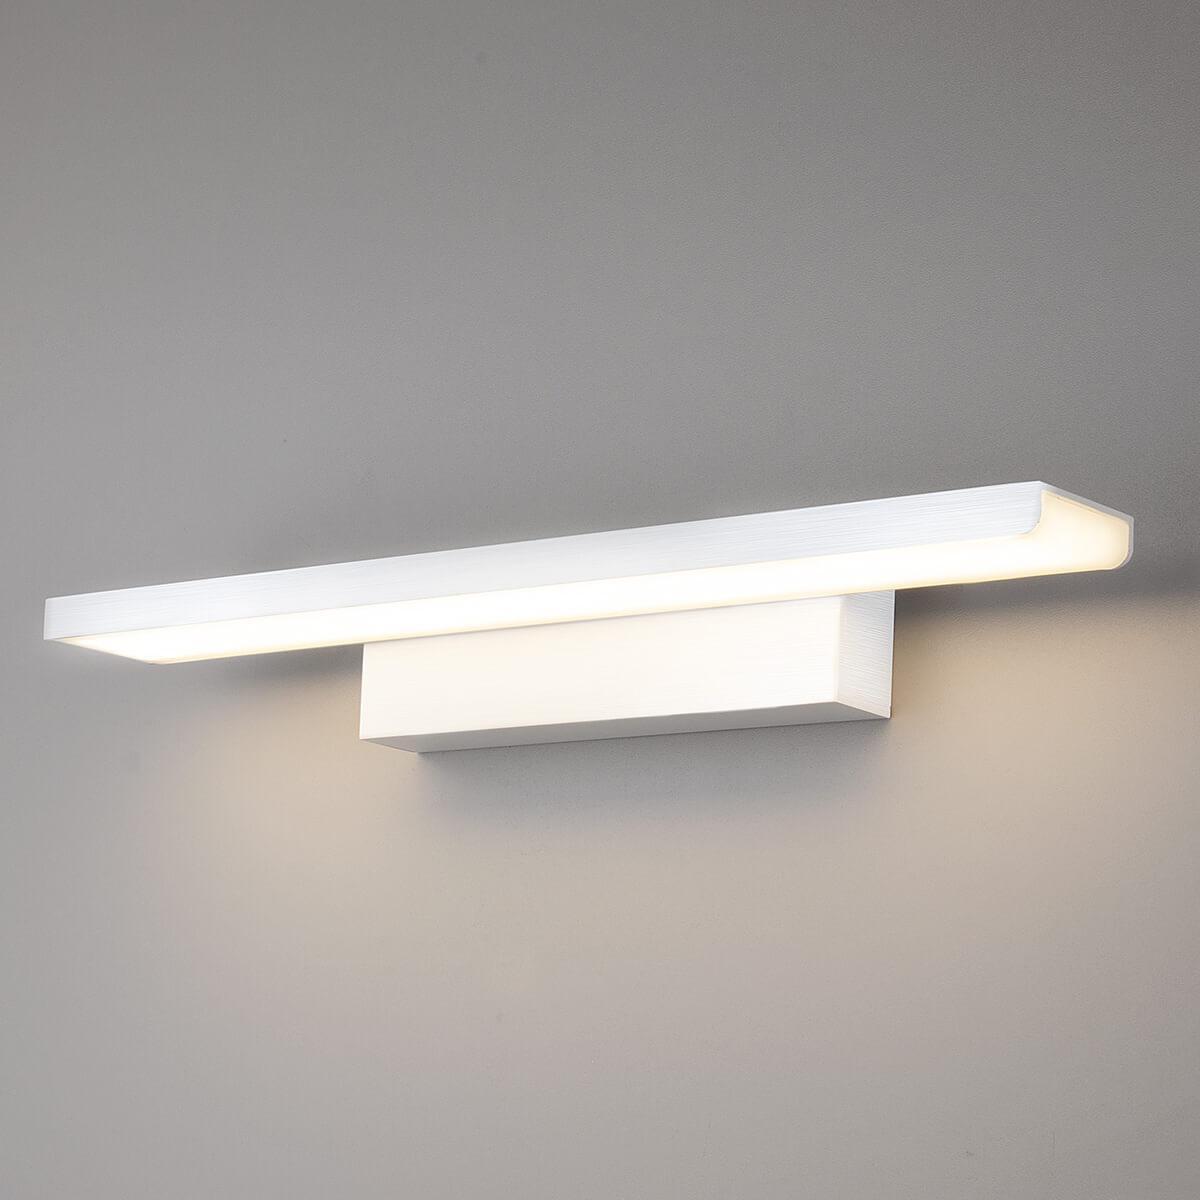 Подсветка для картин Elektrostandard 4690389106125, LED, 16 Вт подсветка для картин elektrostandard sankara led 16w 1009 ip20 черная 4690389102790